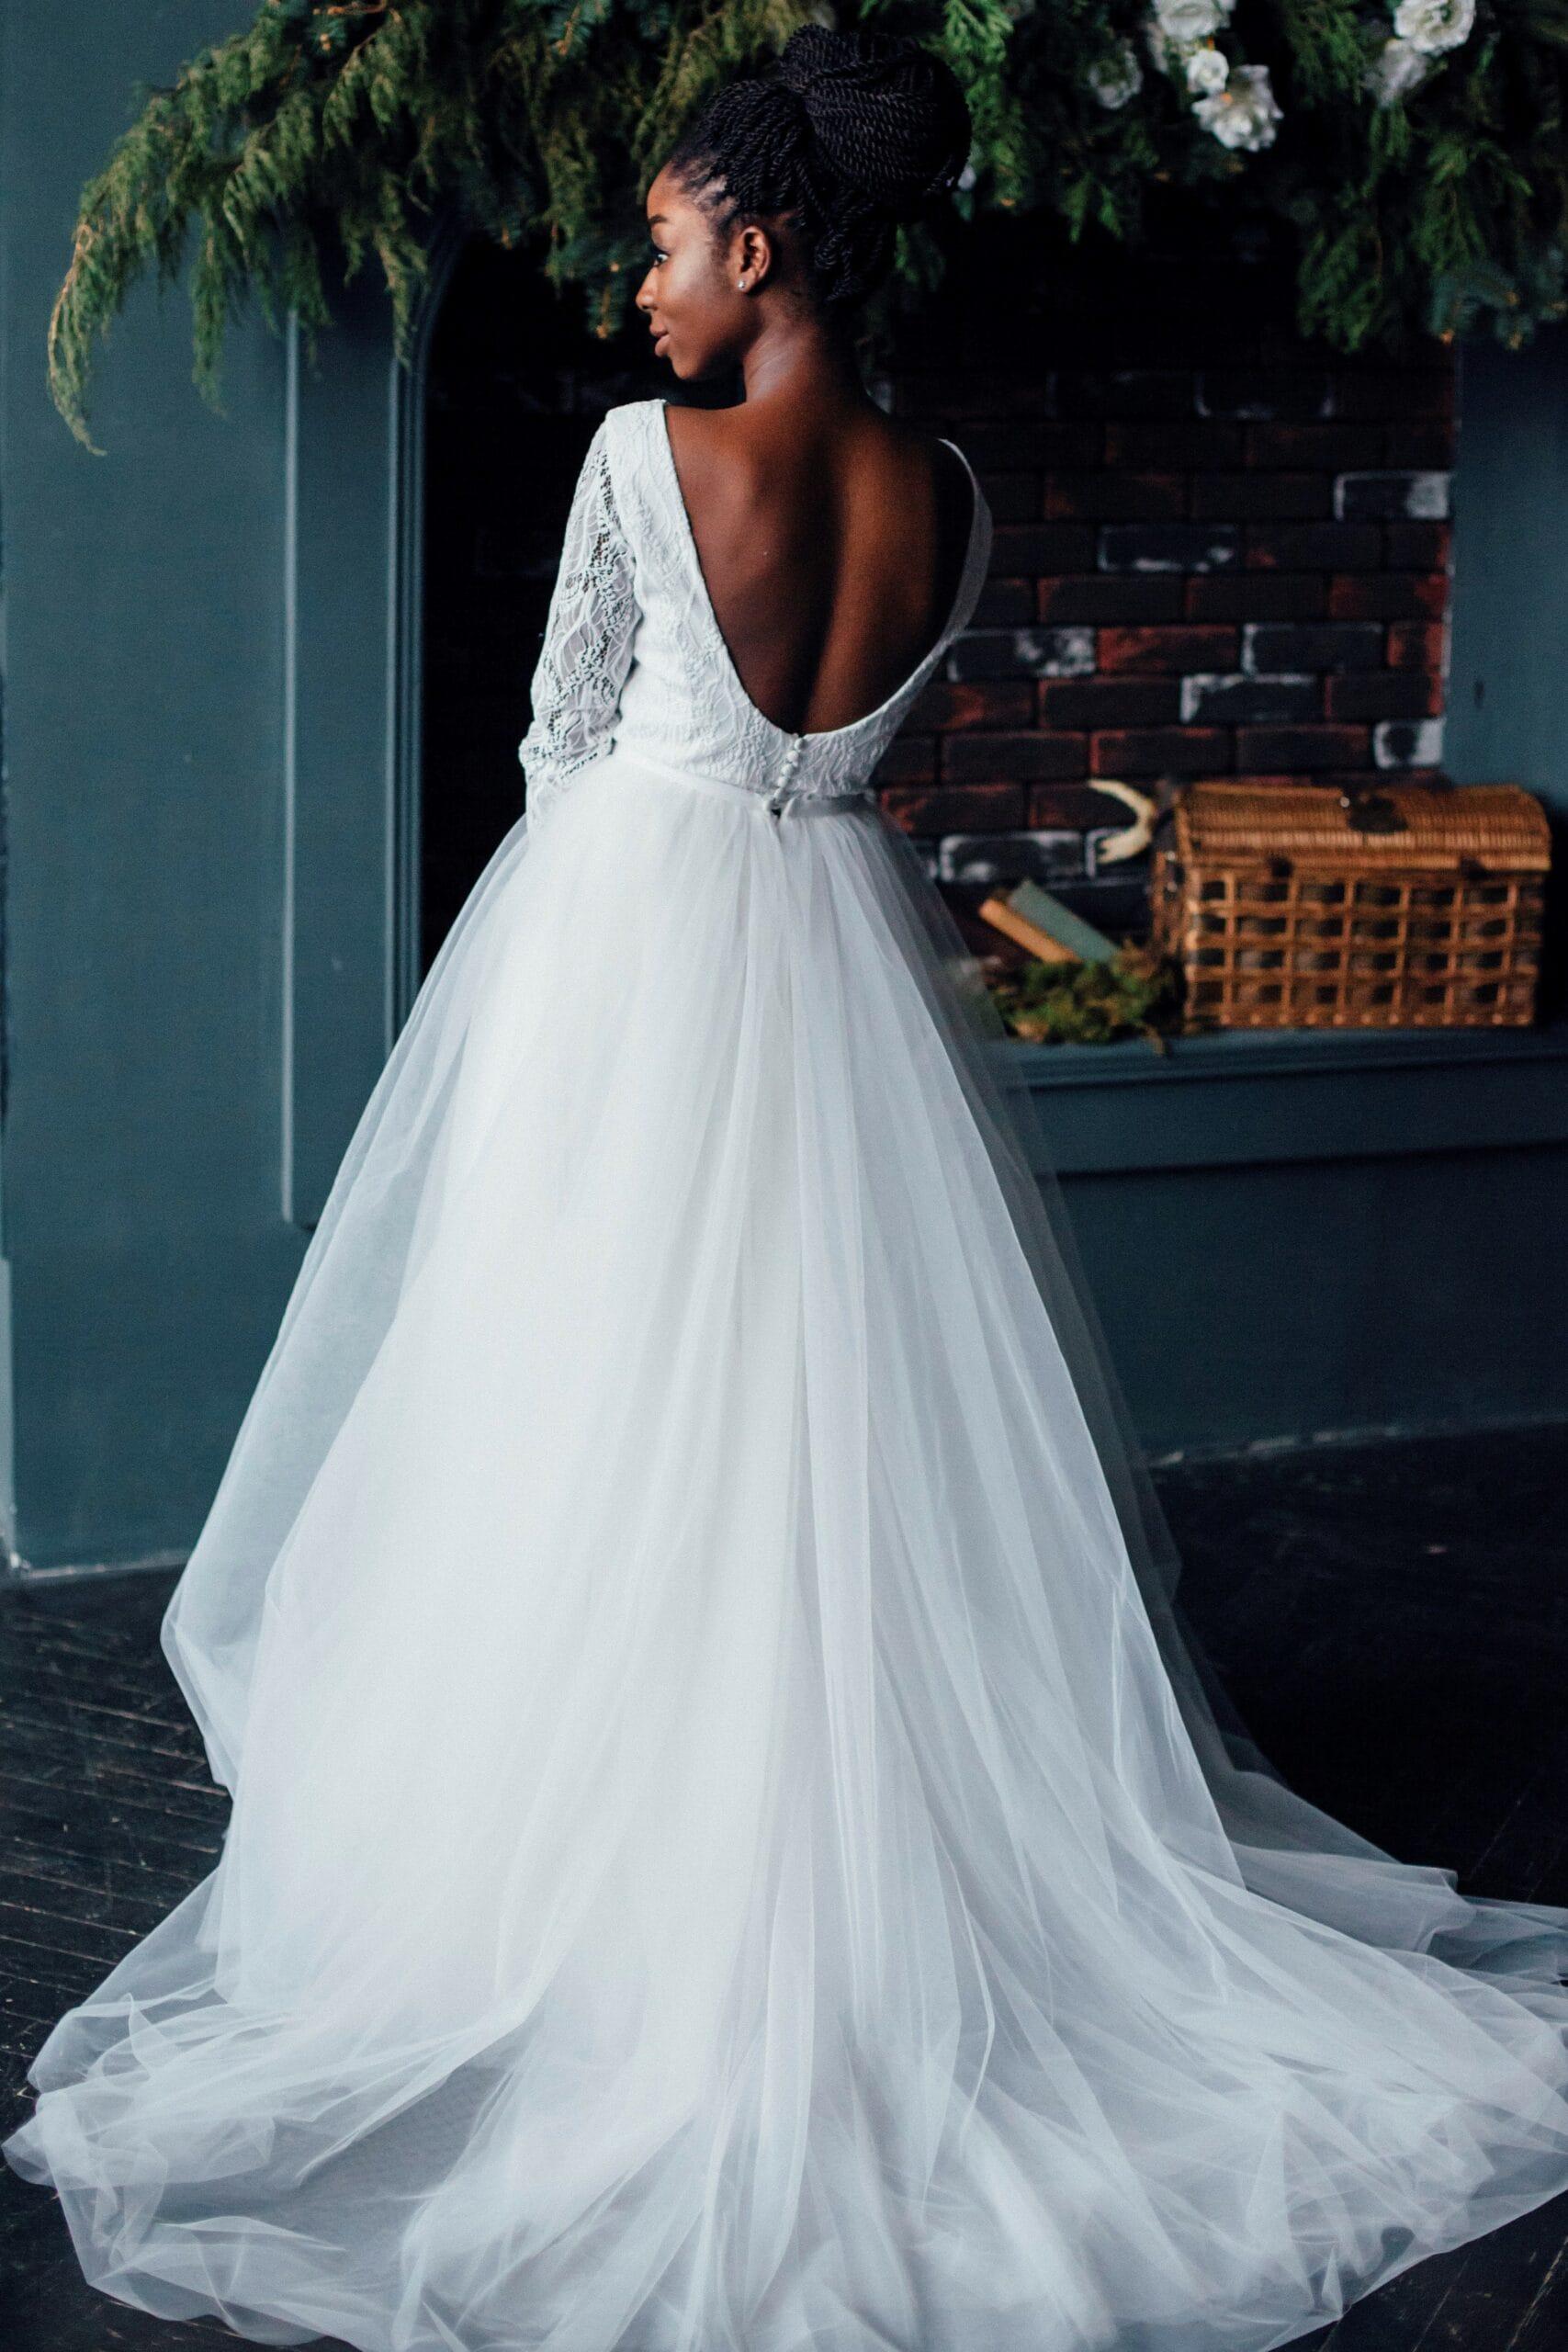 Свадебное платье JESSICA, коллекция THE ABSOLUTE LOVE, бренд RARE BRIDAL, фото 1